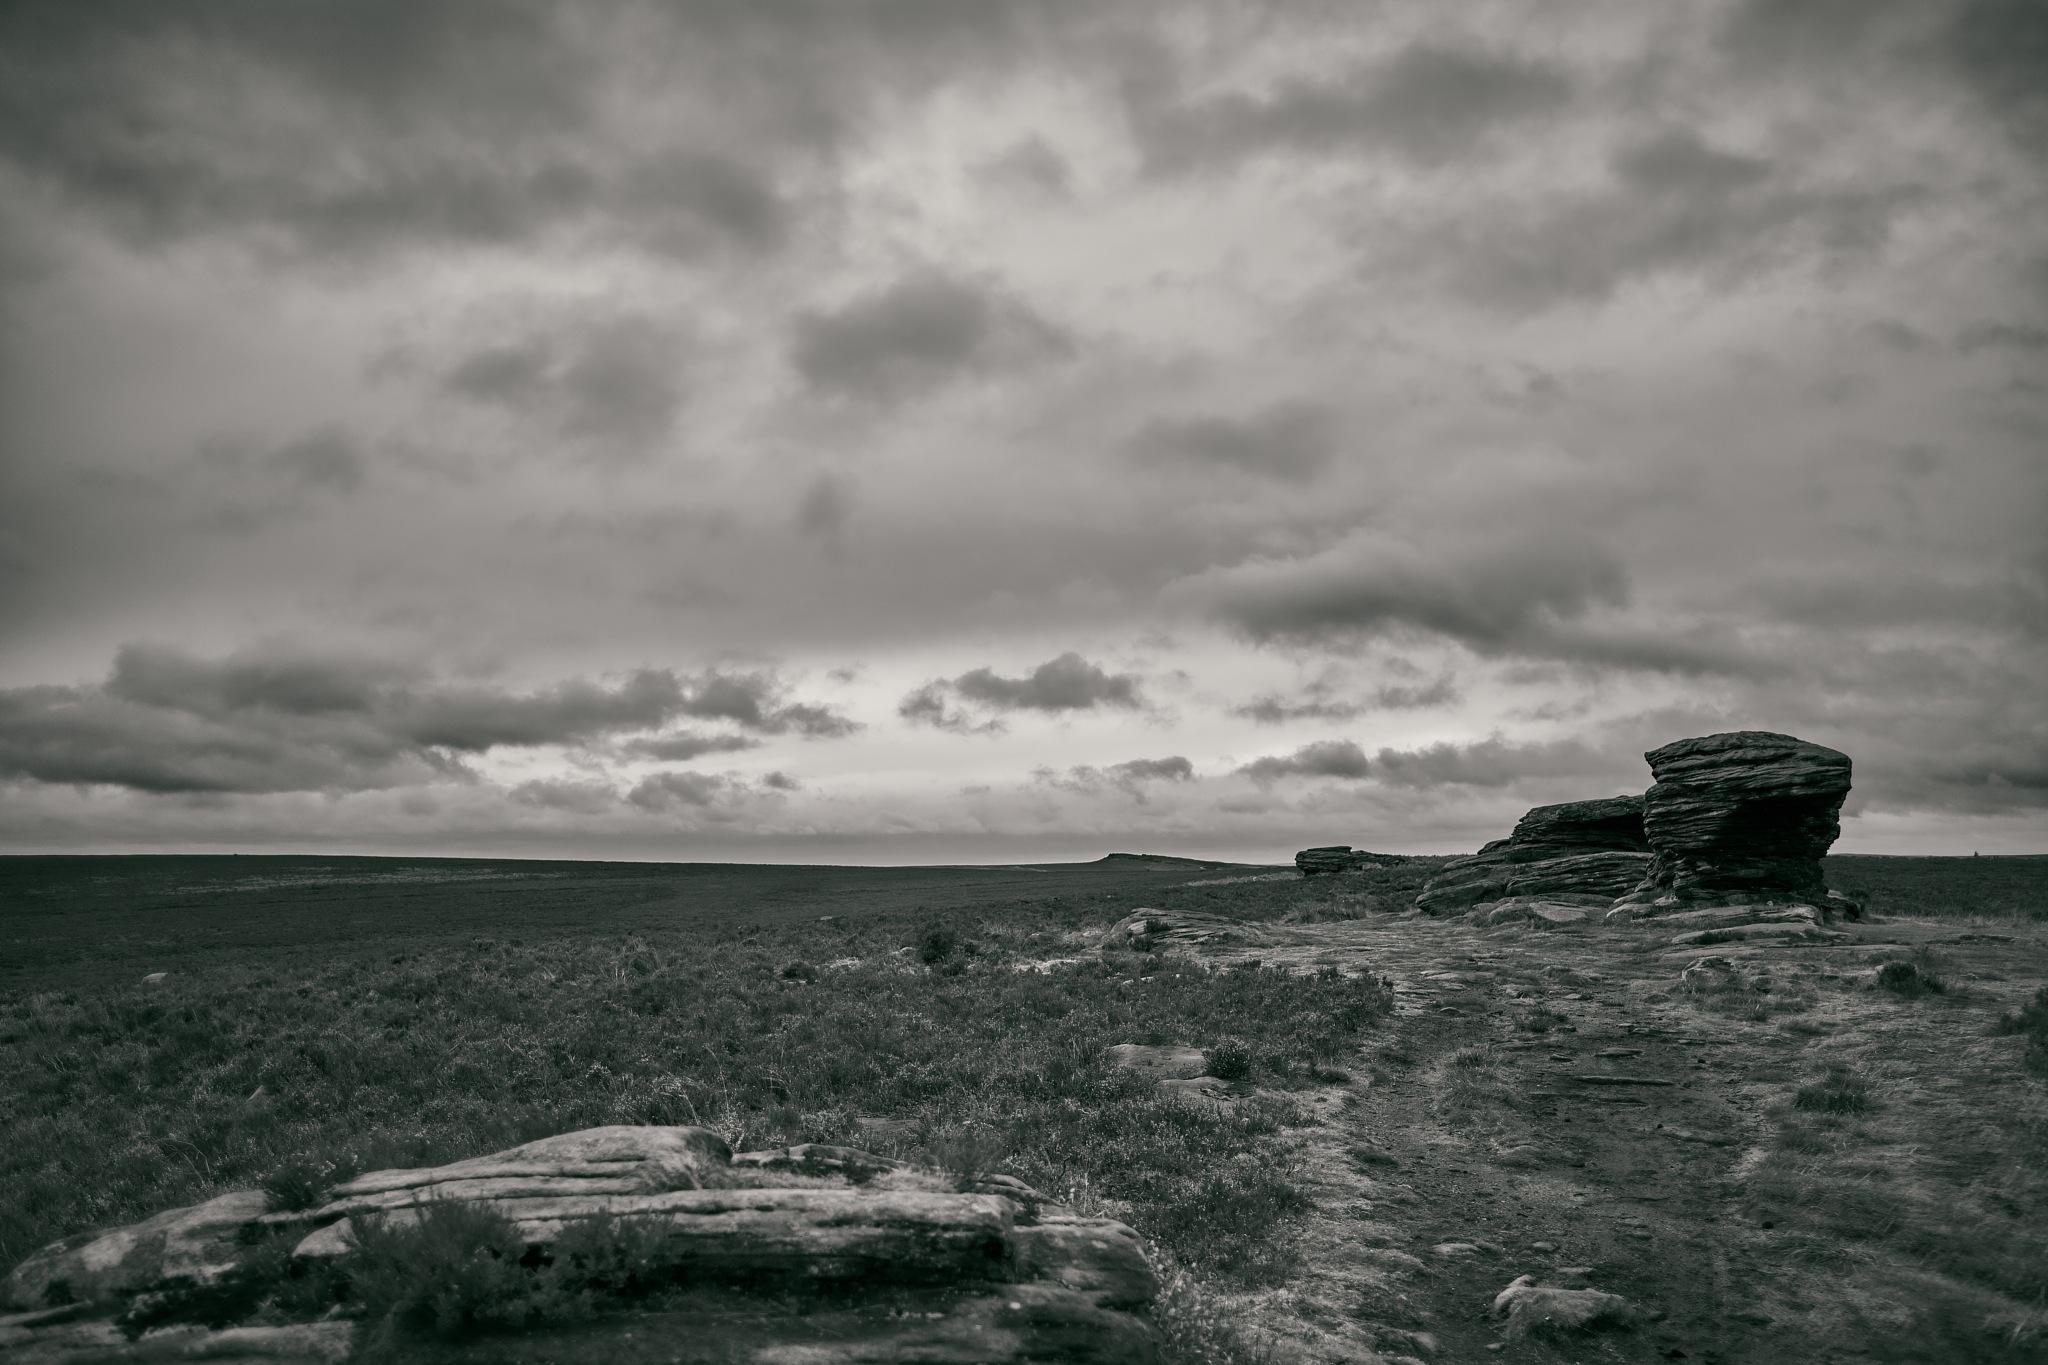 Barren landscape by James Butters